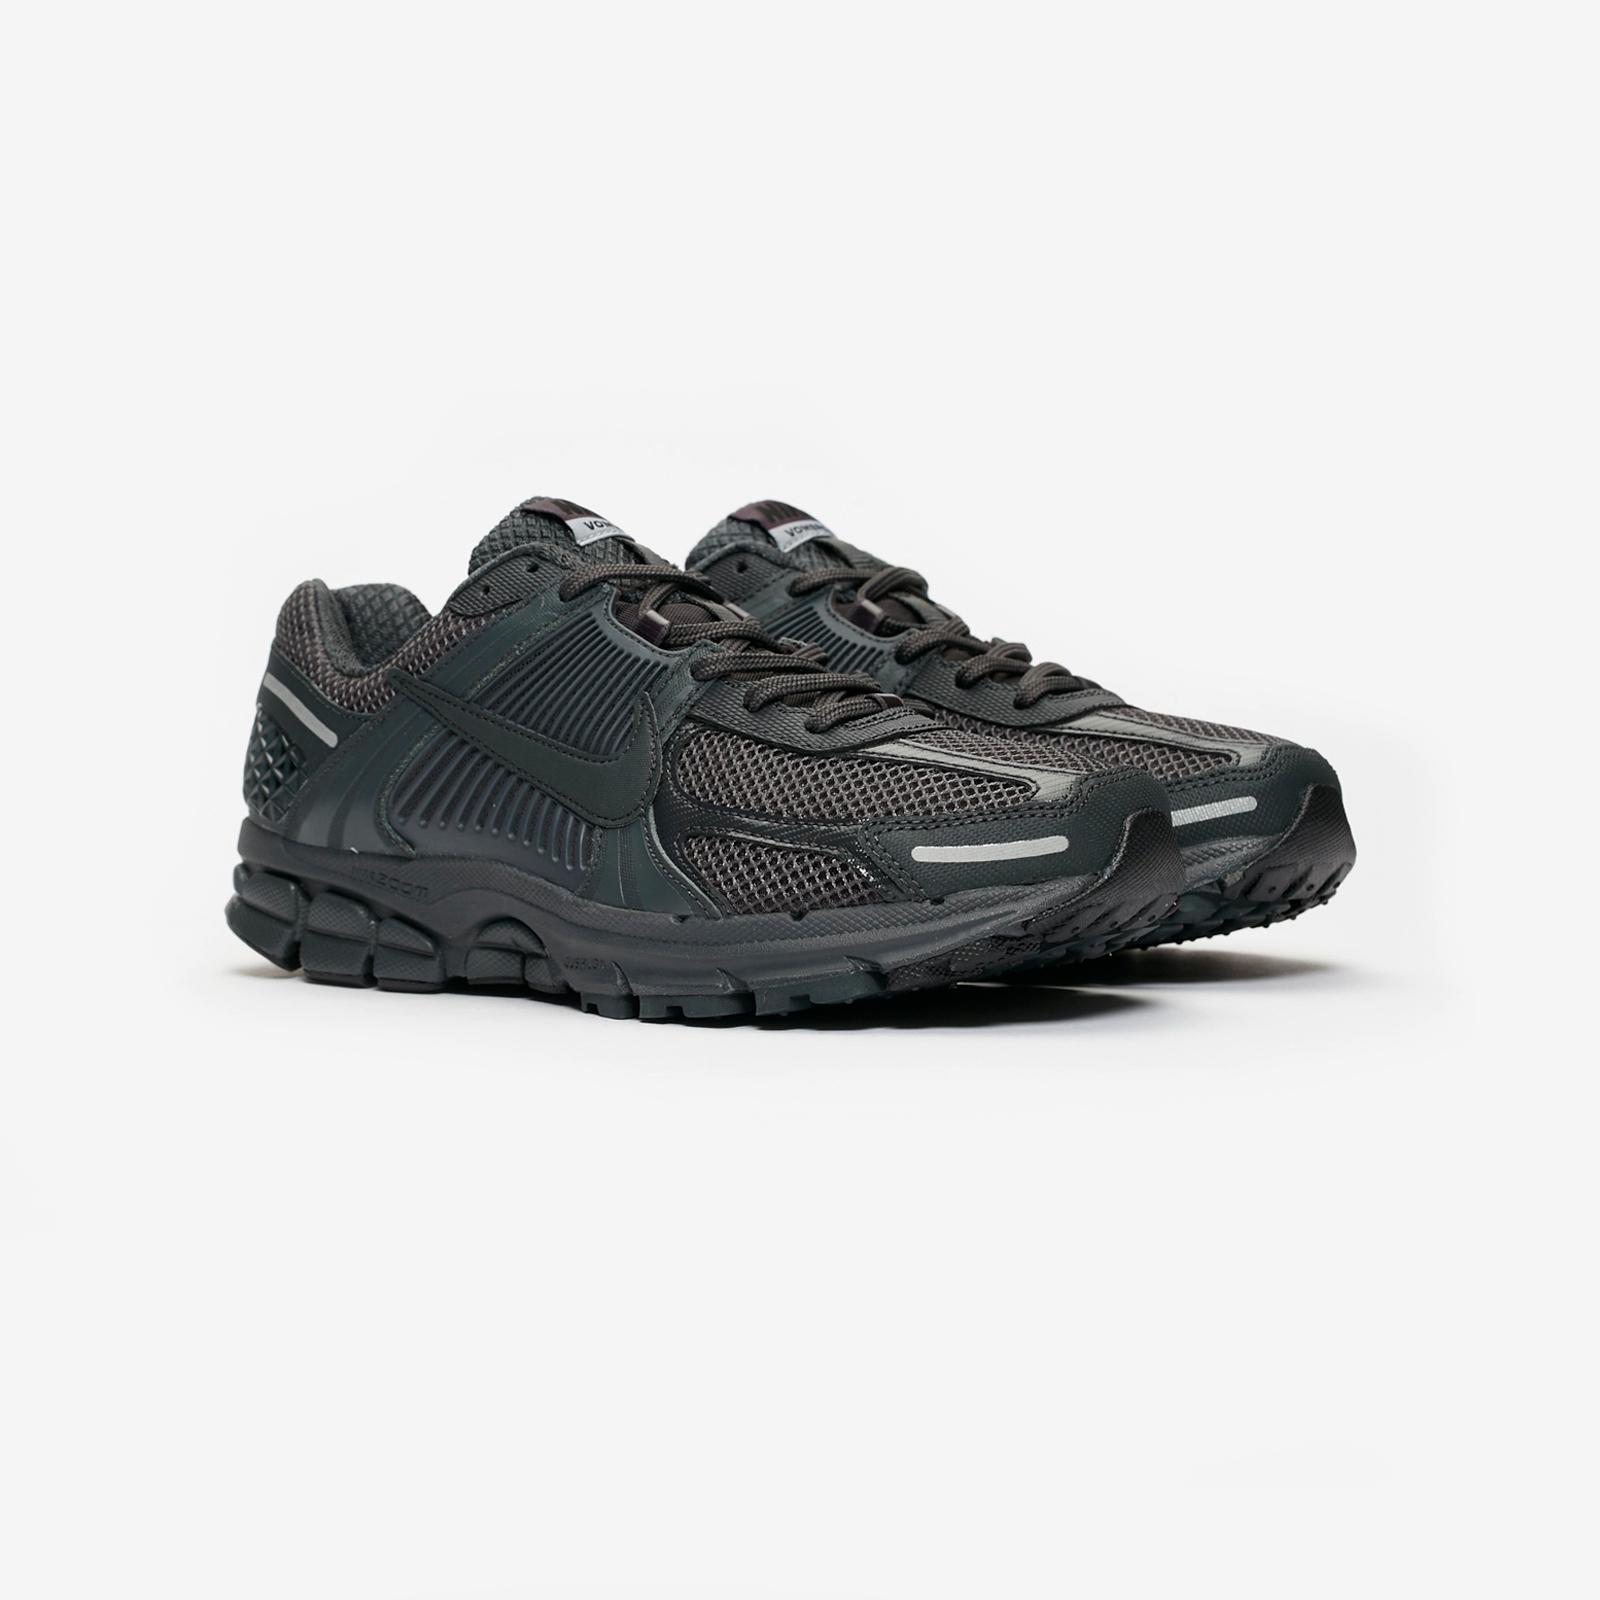 half off f6151 cc934 NikeLab Zoom Vomero 5 SP